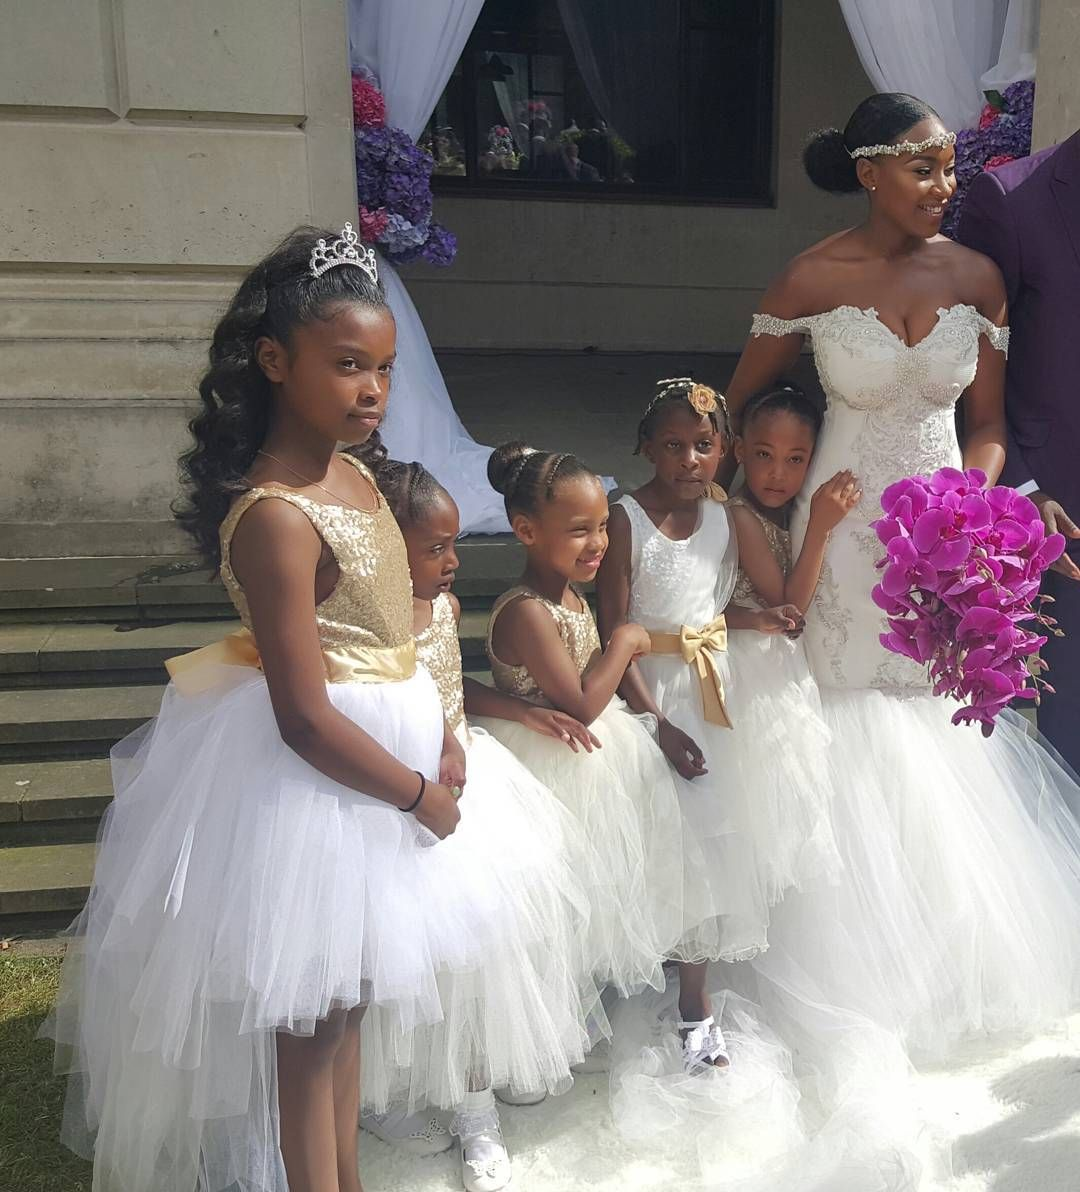 Kandi burruss wedding dress  Pin by Tiffany Dillon on Terrius wedding  Pinterest  Flower girl